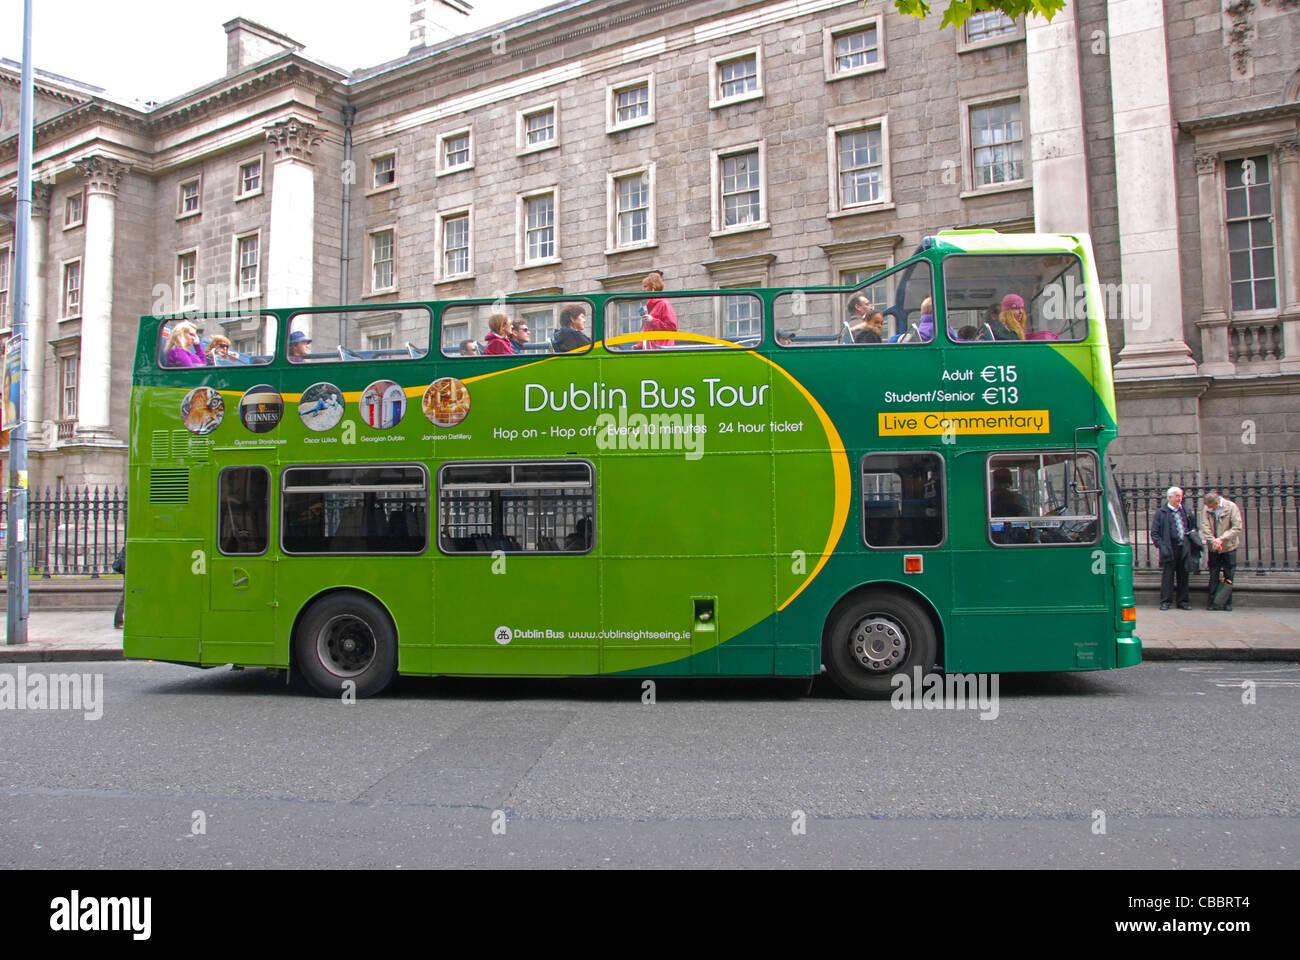 Dublin Bus Hop On Hop Off Tour Bus Ireland Uk   Stock Image